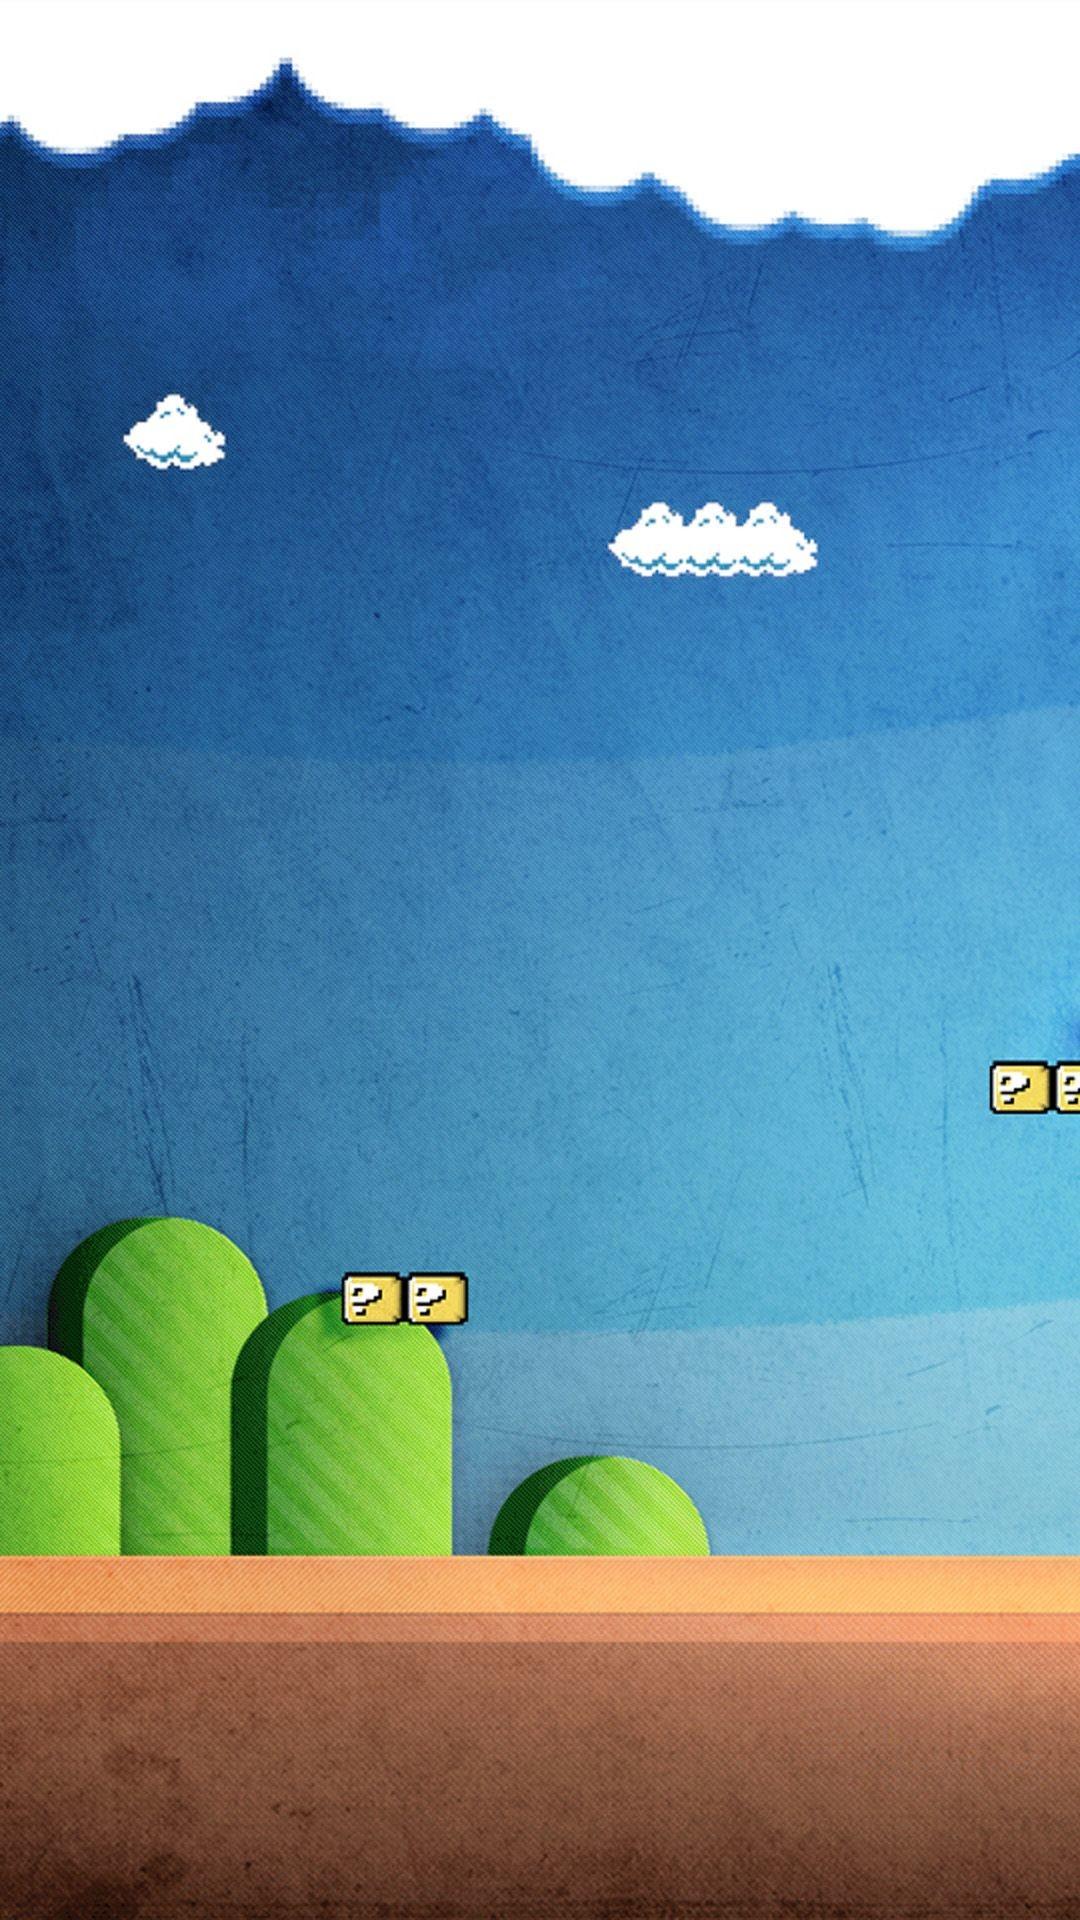 Wallpaper iphone nintendo – Super. Download